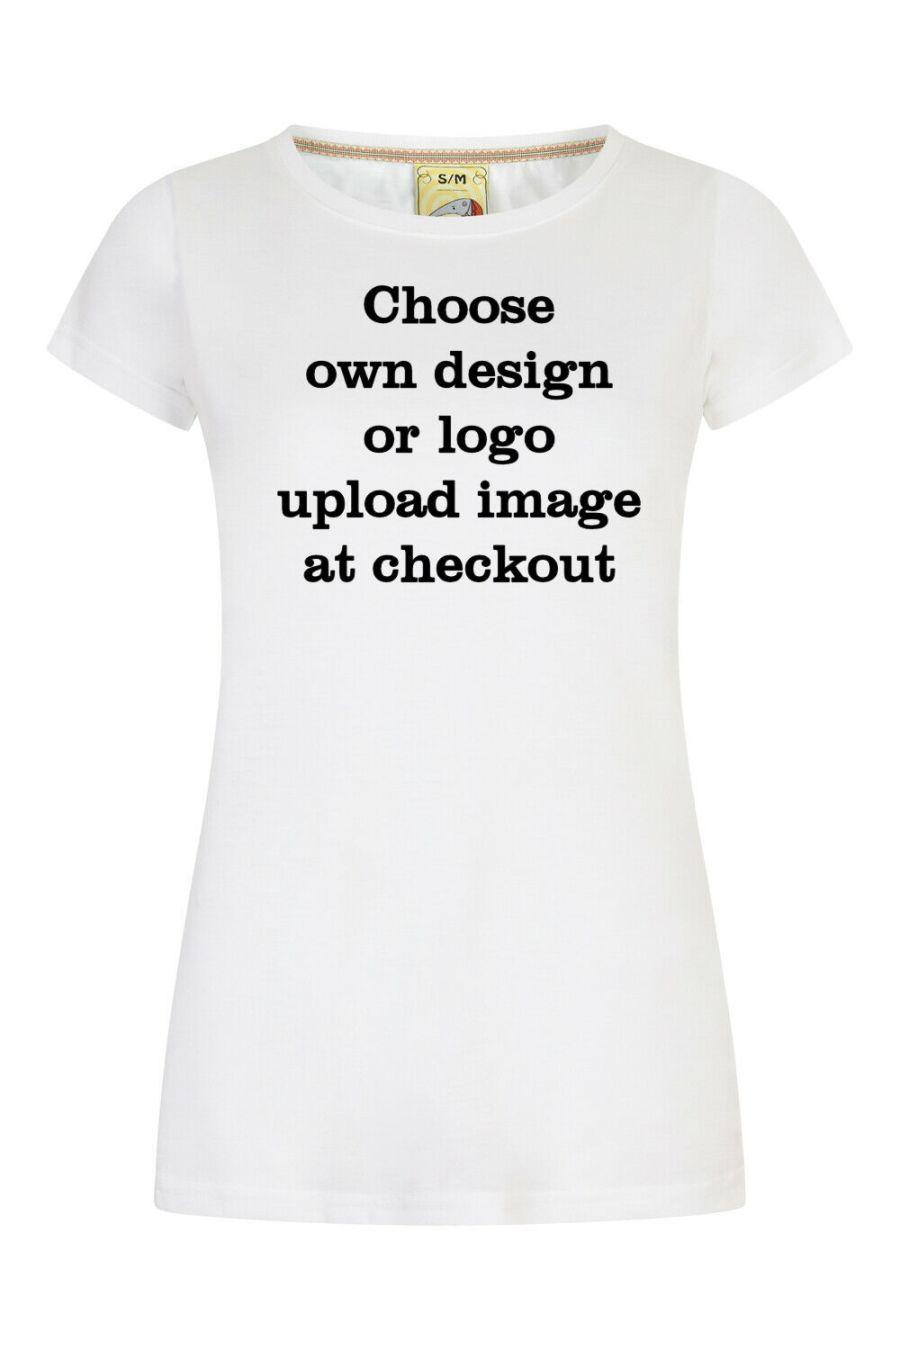 Ladies design your own t-shirt, logo or wording